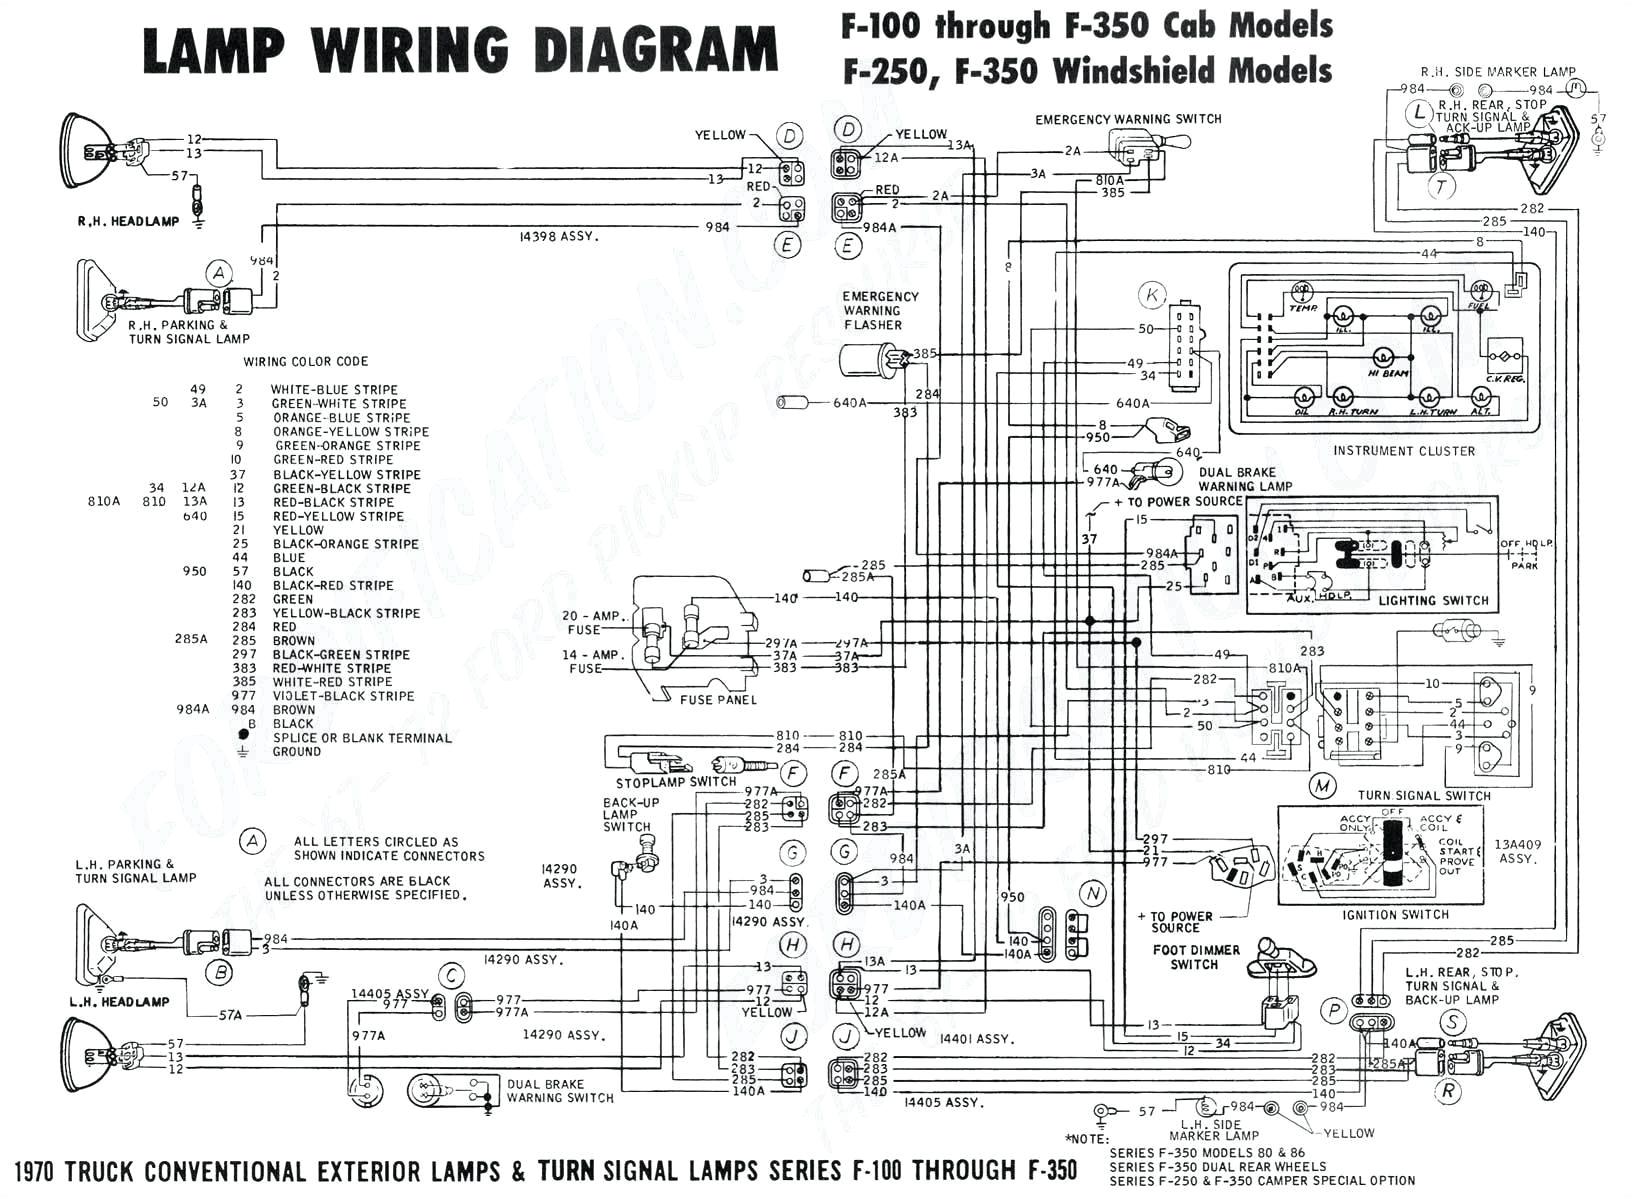 1938 buick wiring diagram schematic wiring diagram view 1938 buick wiring diagram